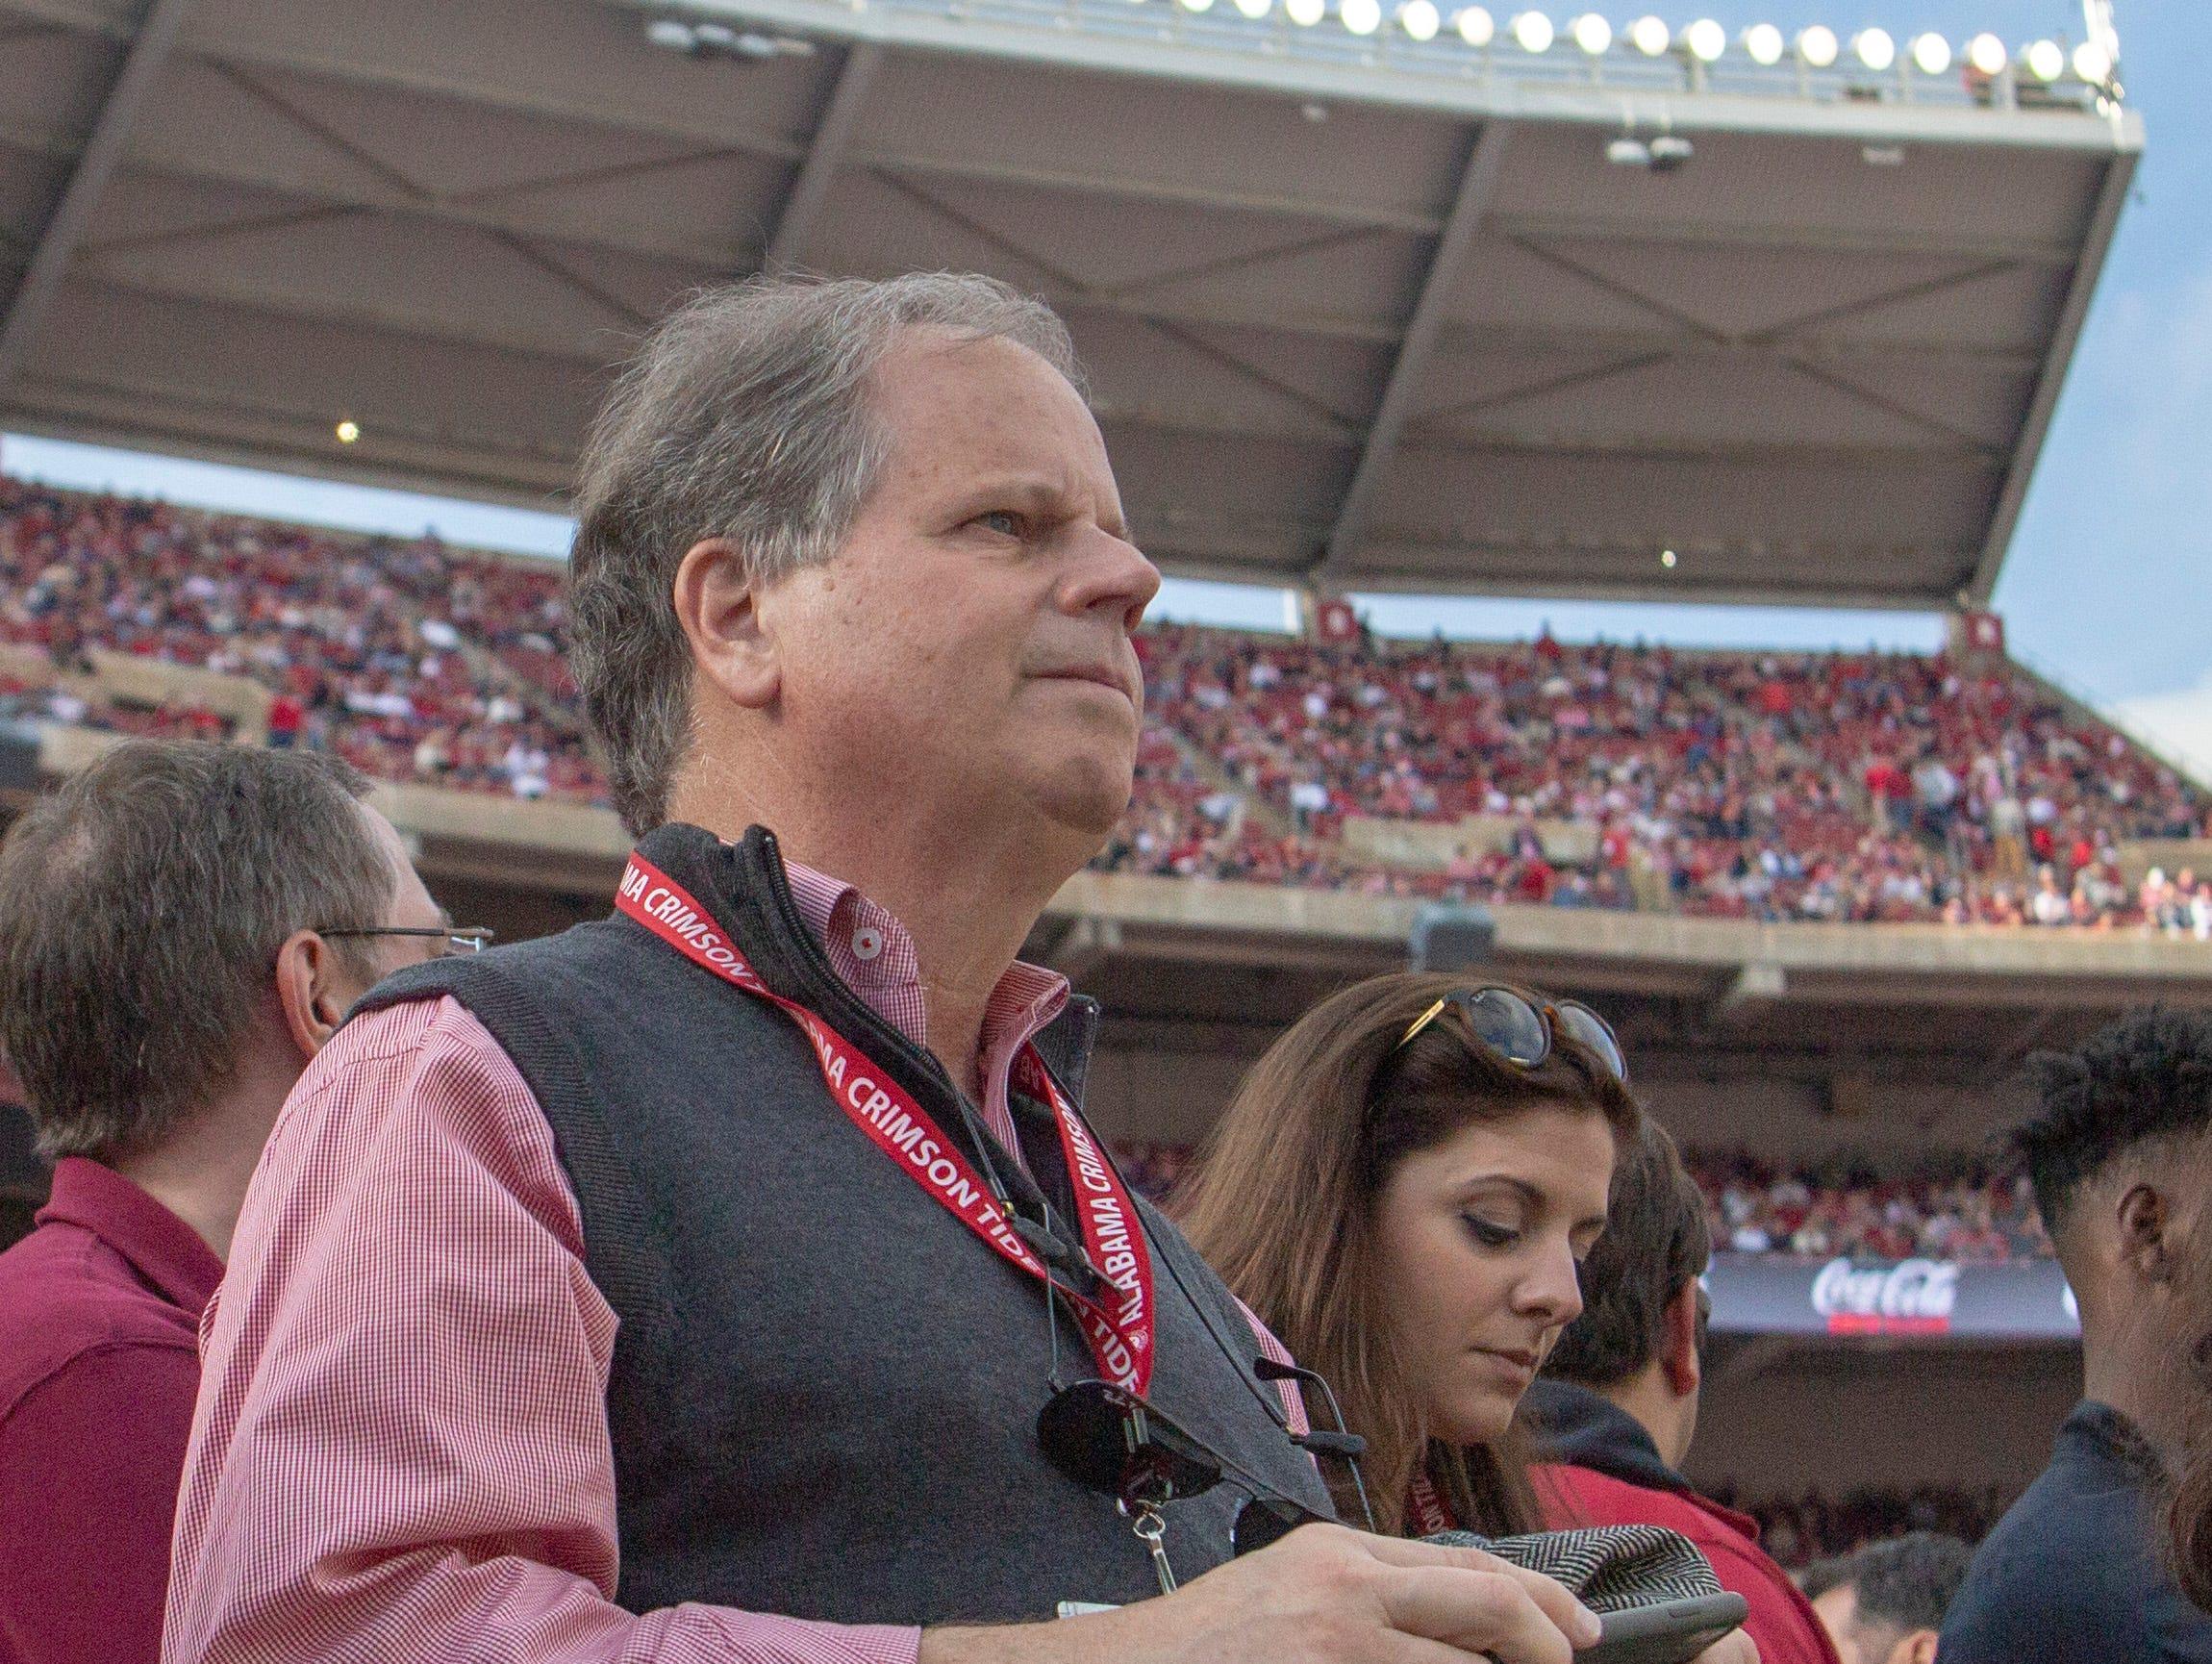 U.S. Sen. Doug Jones looks on as both Alabama and Auburn's football teams warm up before kickoff.